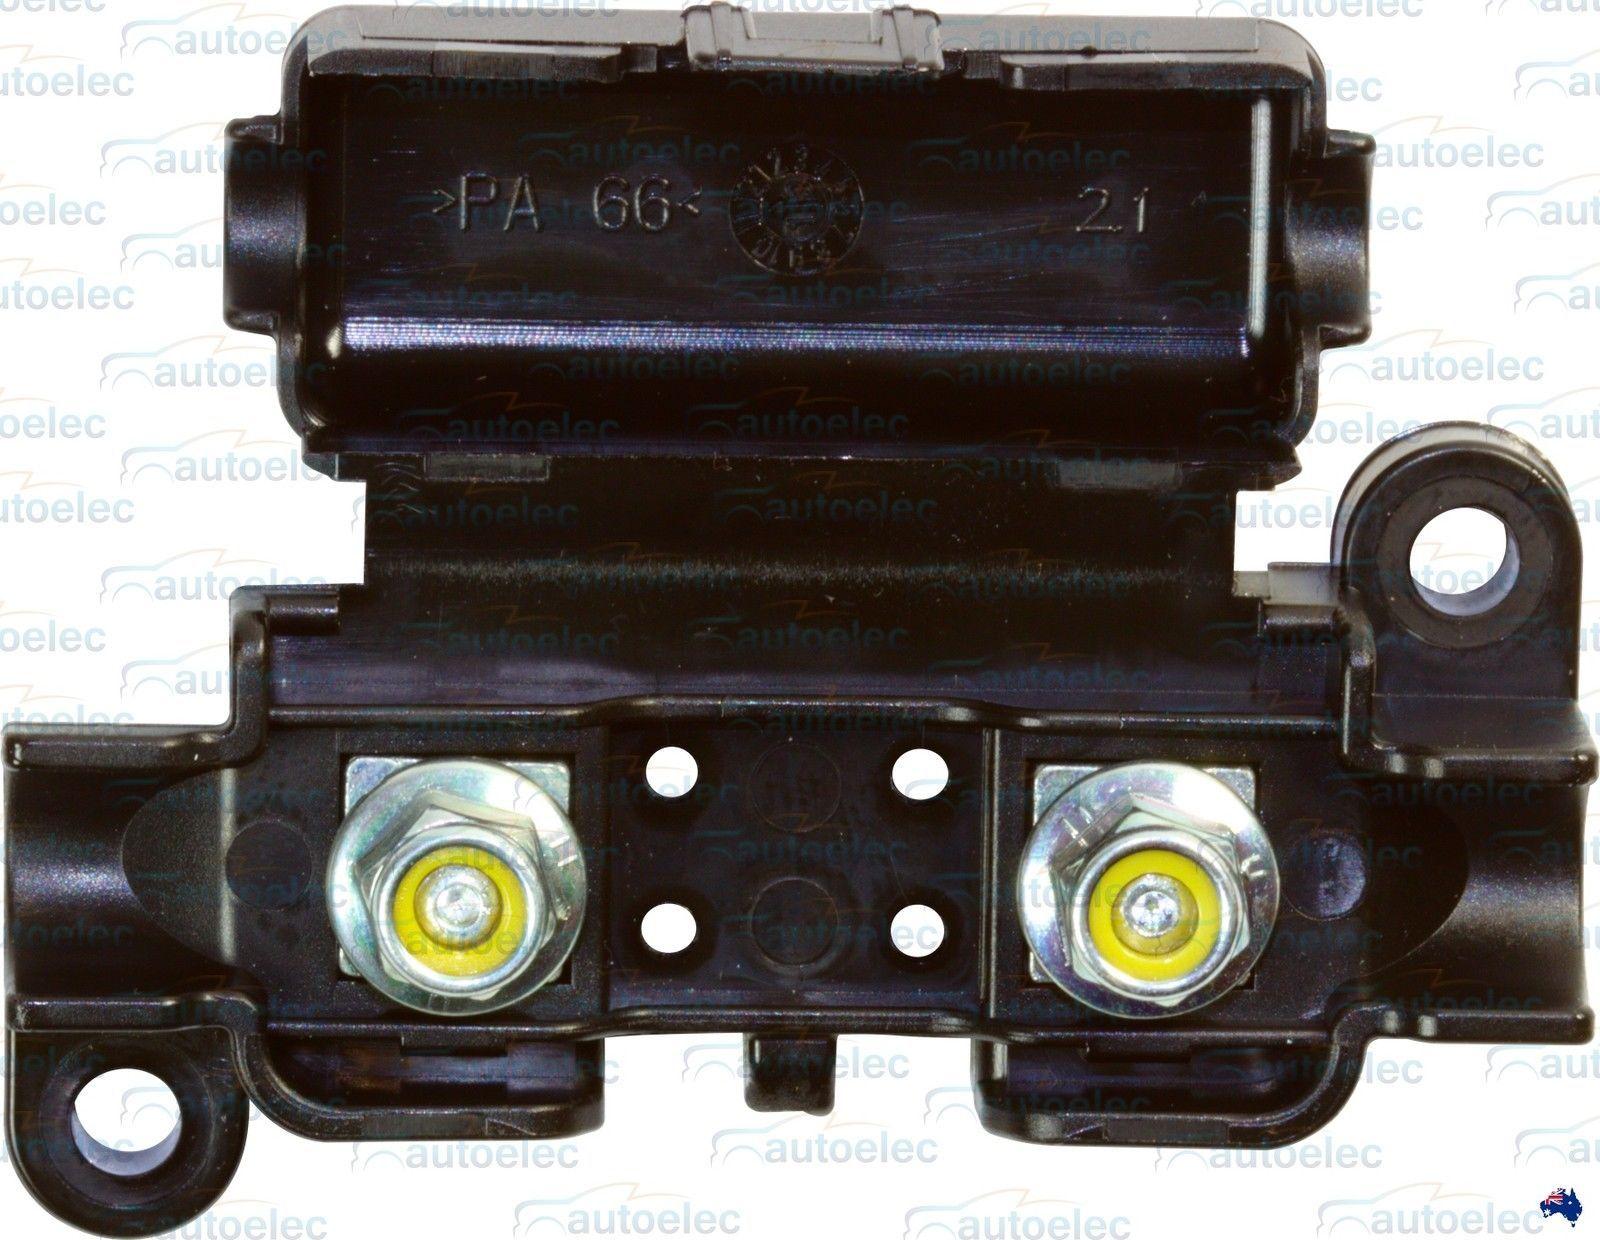 hight resolution of redarc 40a fuse holder kit suit bcdc1225 dual battery system fk40 redarc fuse boxes redarc 40a